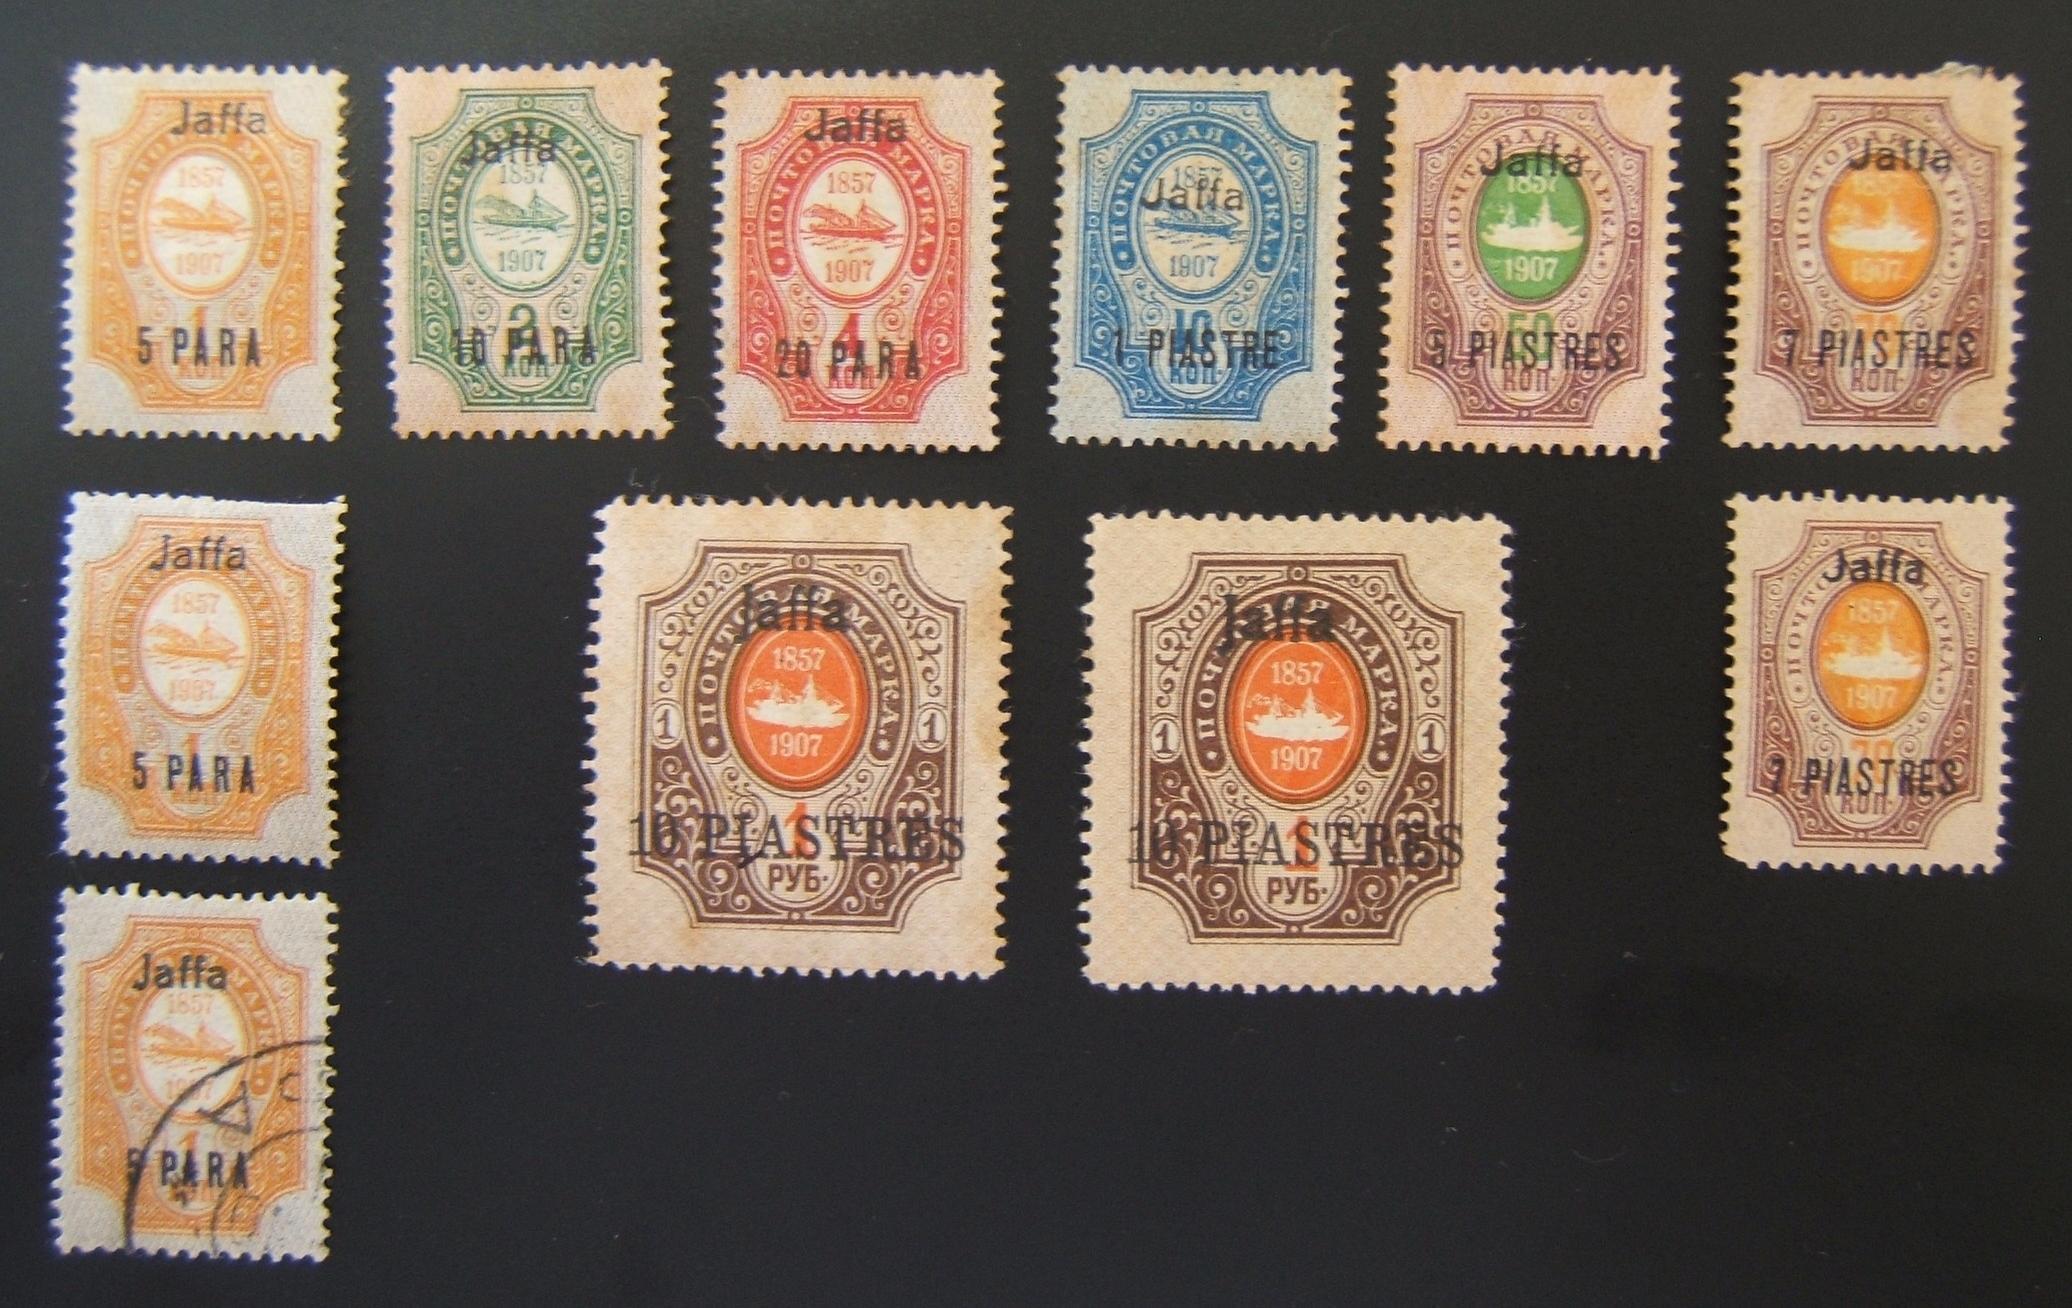 Russische Post Heiliges Land: Menge x11 Marken 1909 ROPiT Serie üverstempelt